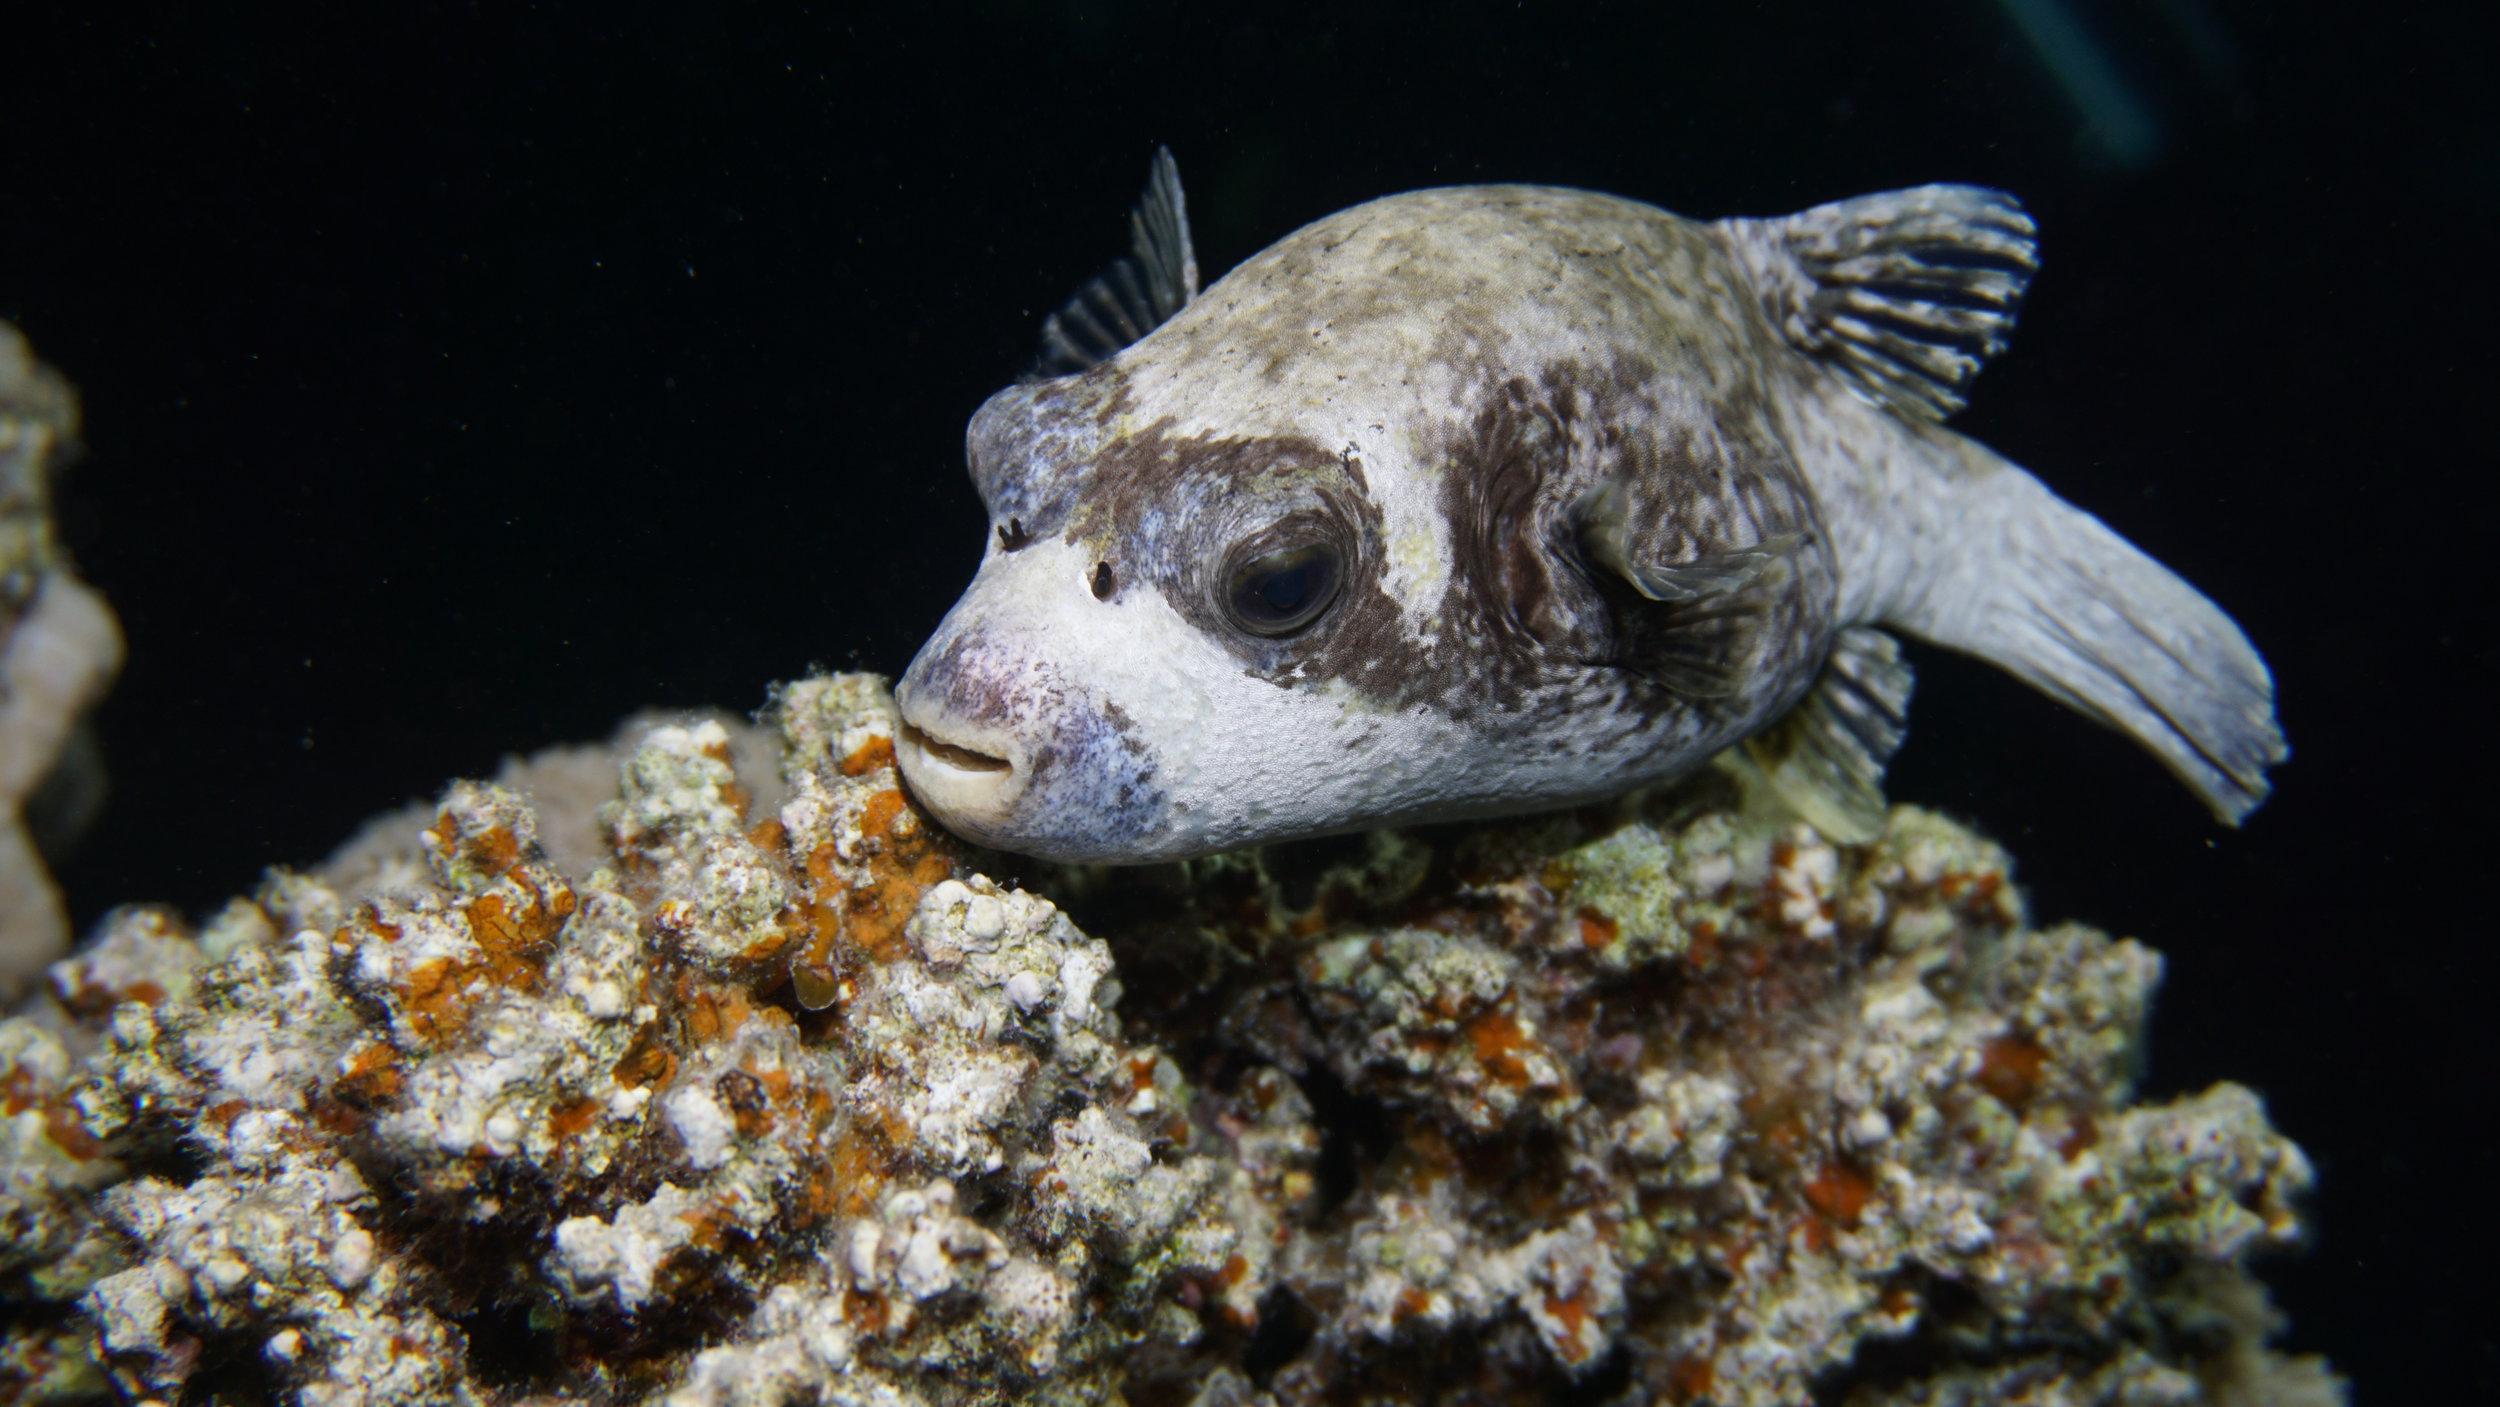 puffer credit: Ceyhan Bekiroglu / coral reef image bank